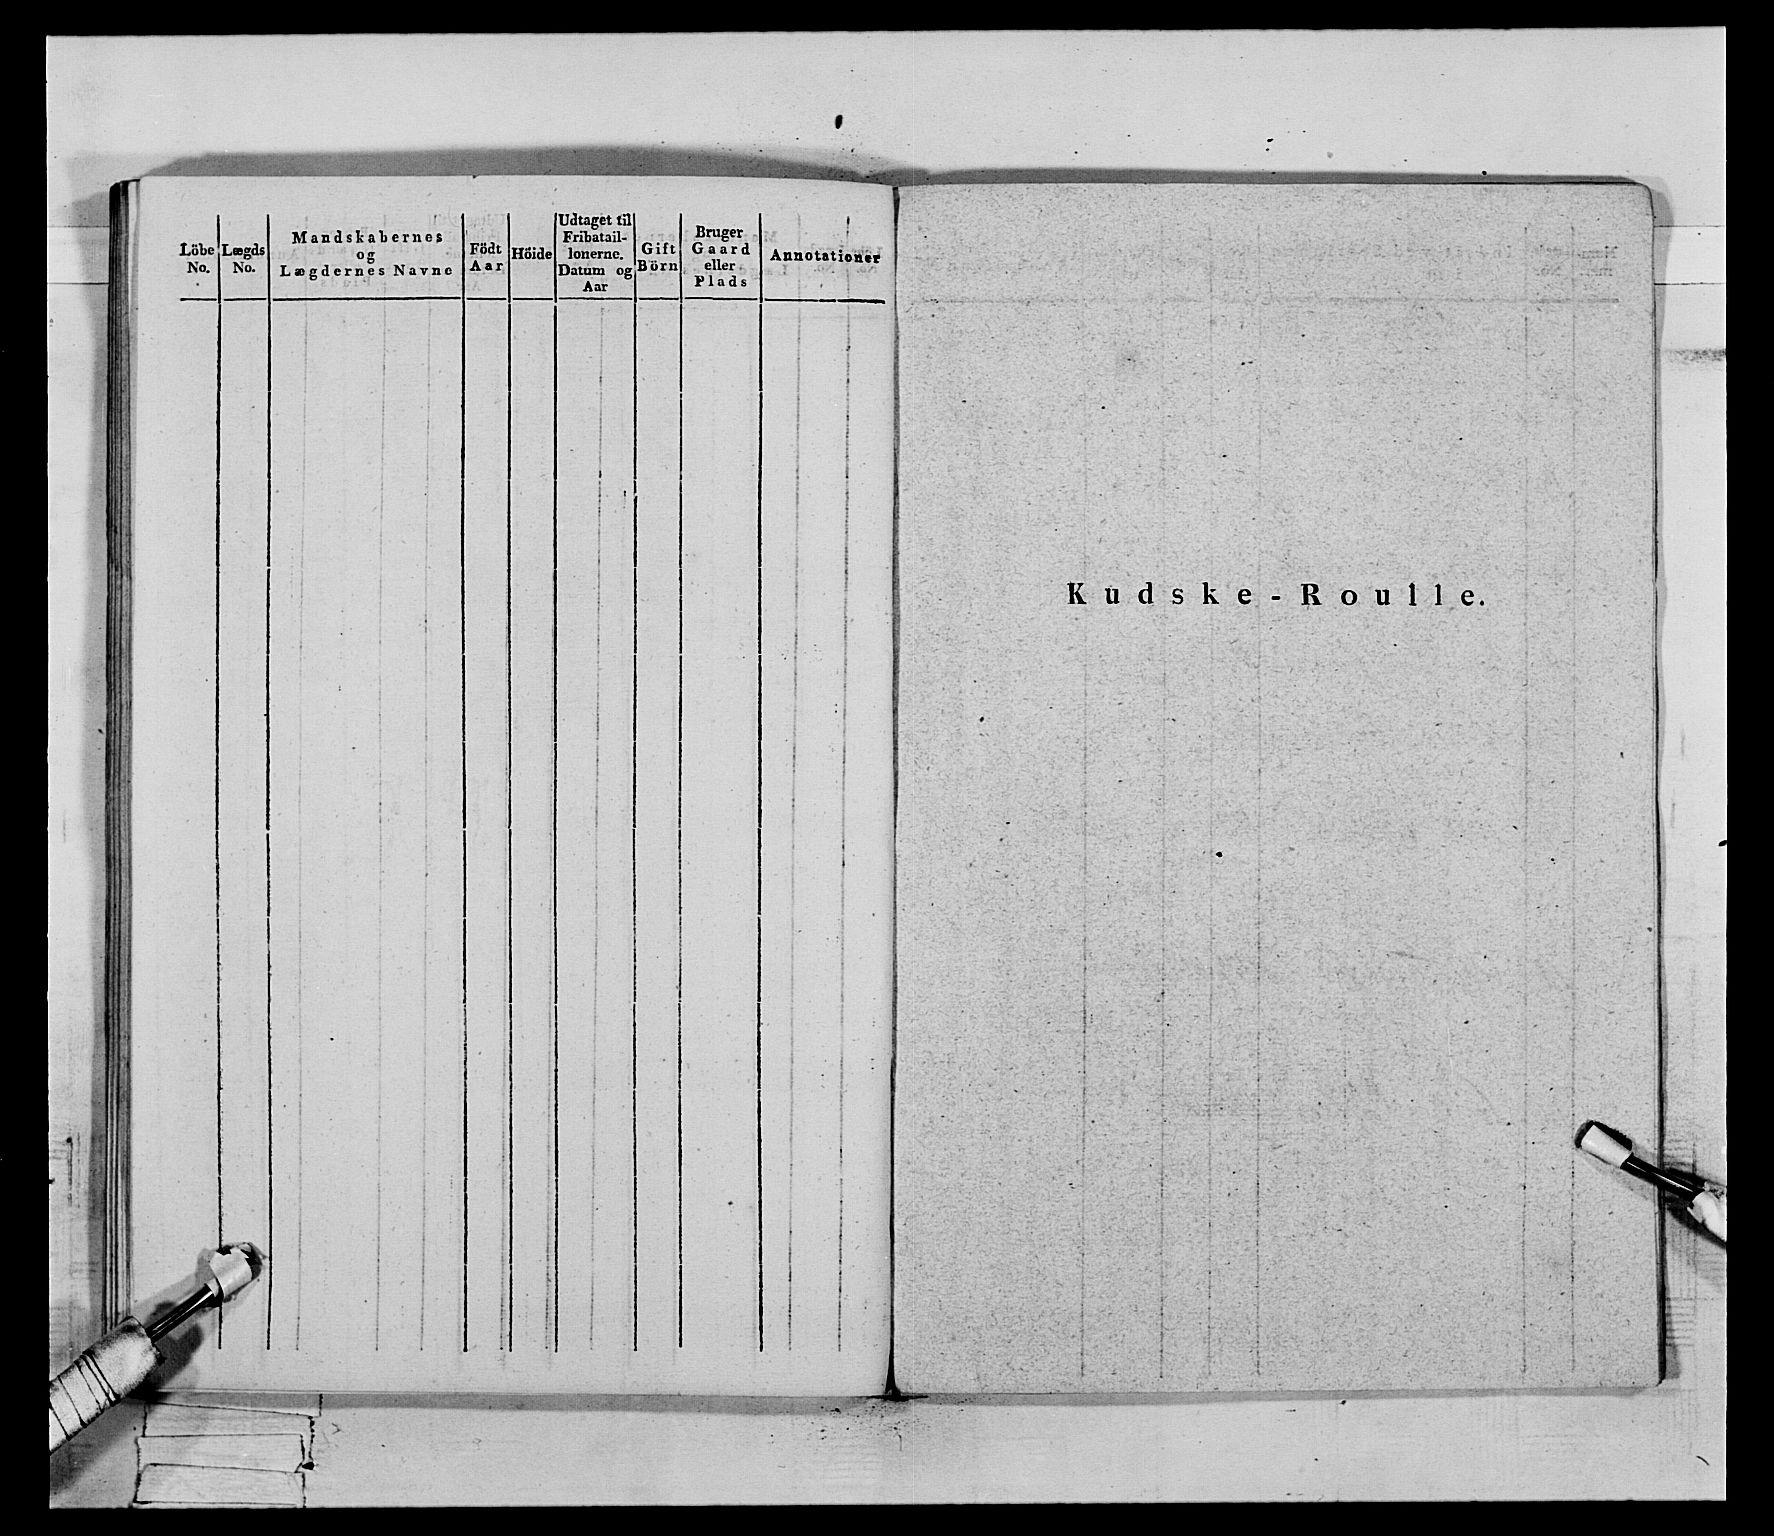 RA, Generalitets- og kommissariatskollegiet, Det kongelige norske kommissariatskollegium, E/Eh/L0069: Opplandske gevorbne infanteriregiment, 1810-1818, s. 607